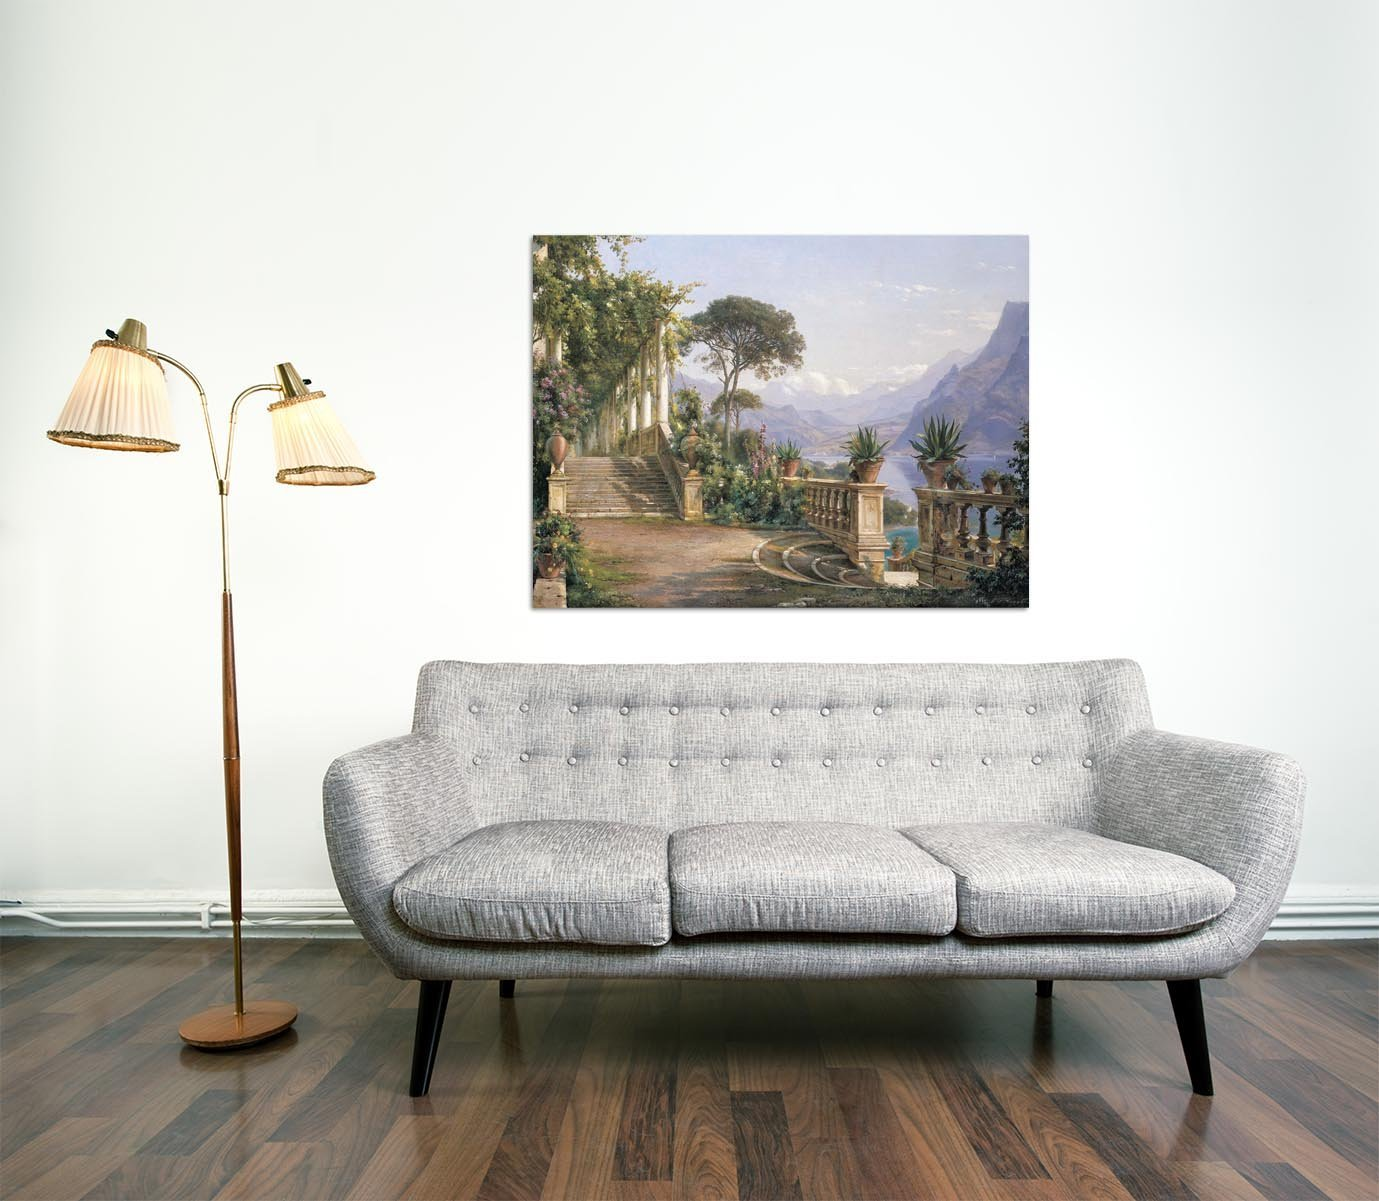 Amazon.de: Aagard Lodge on Lake Como Rahmen MDF-Rand schwarz 100 x 75 cm